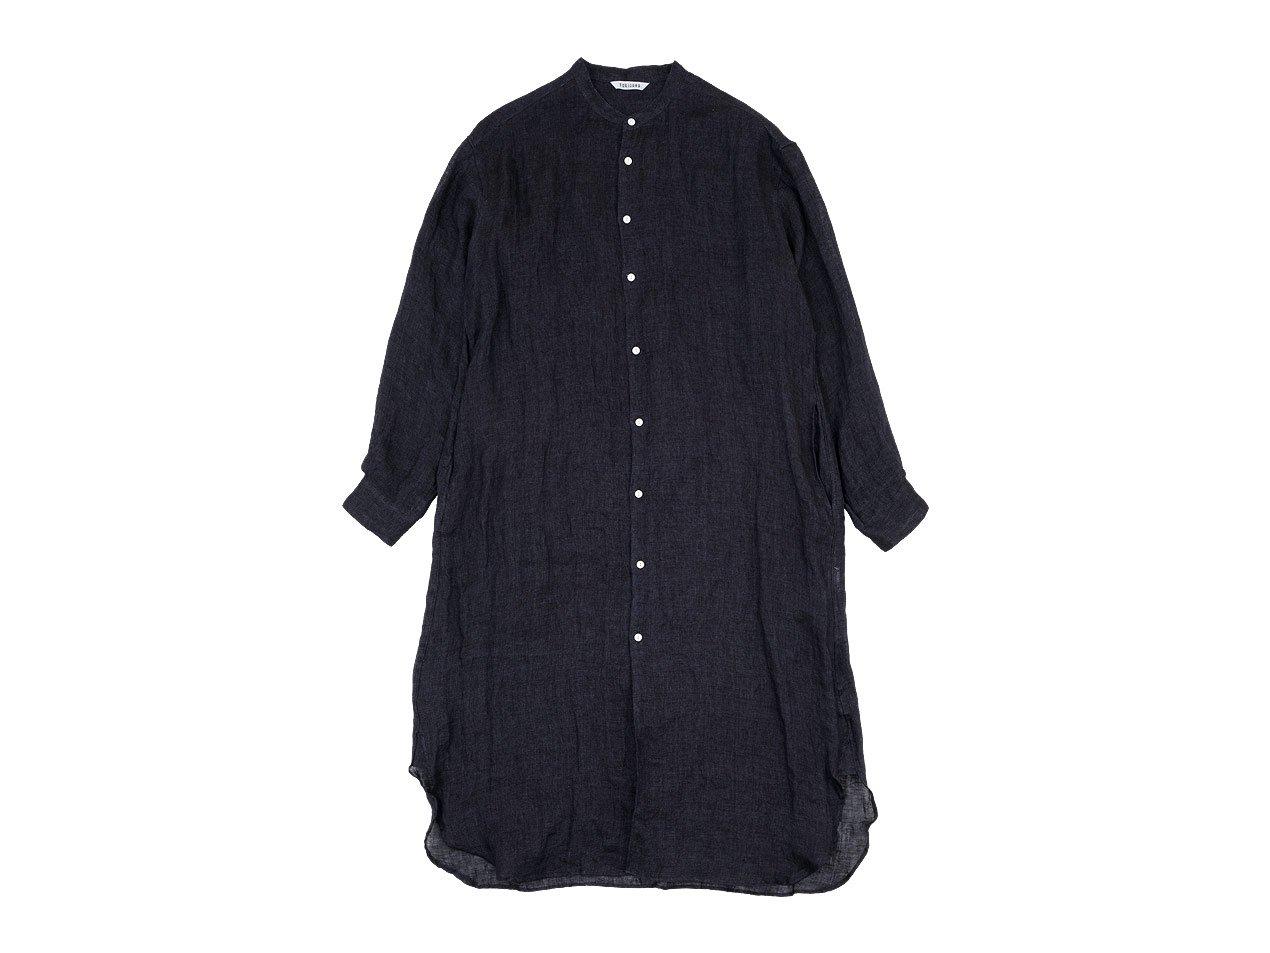 TOUJOURS Oversized Band Collar Shirt Dress BLACK NAVY 【TM30UD03】